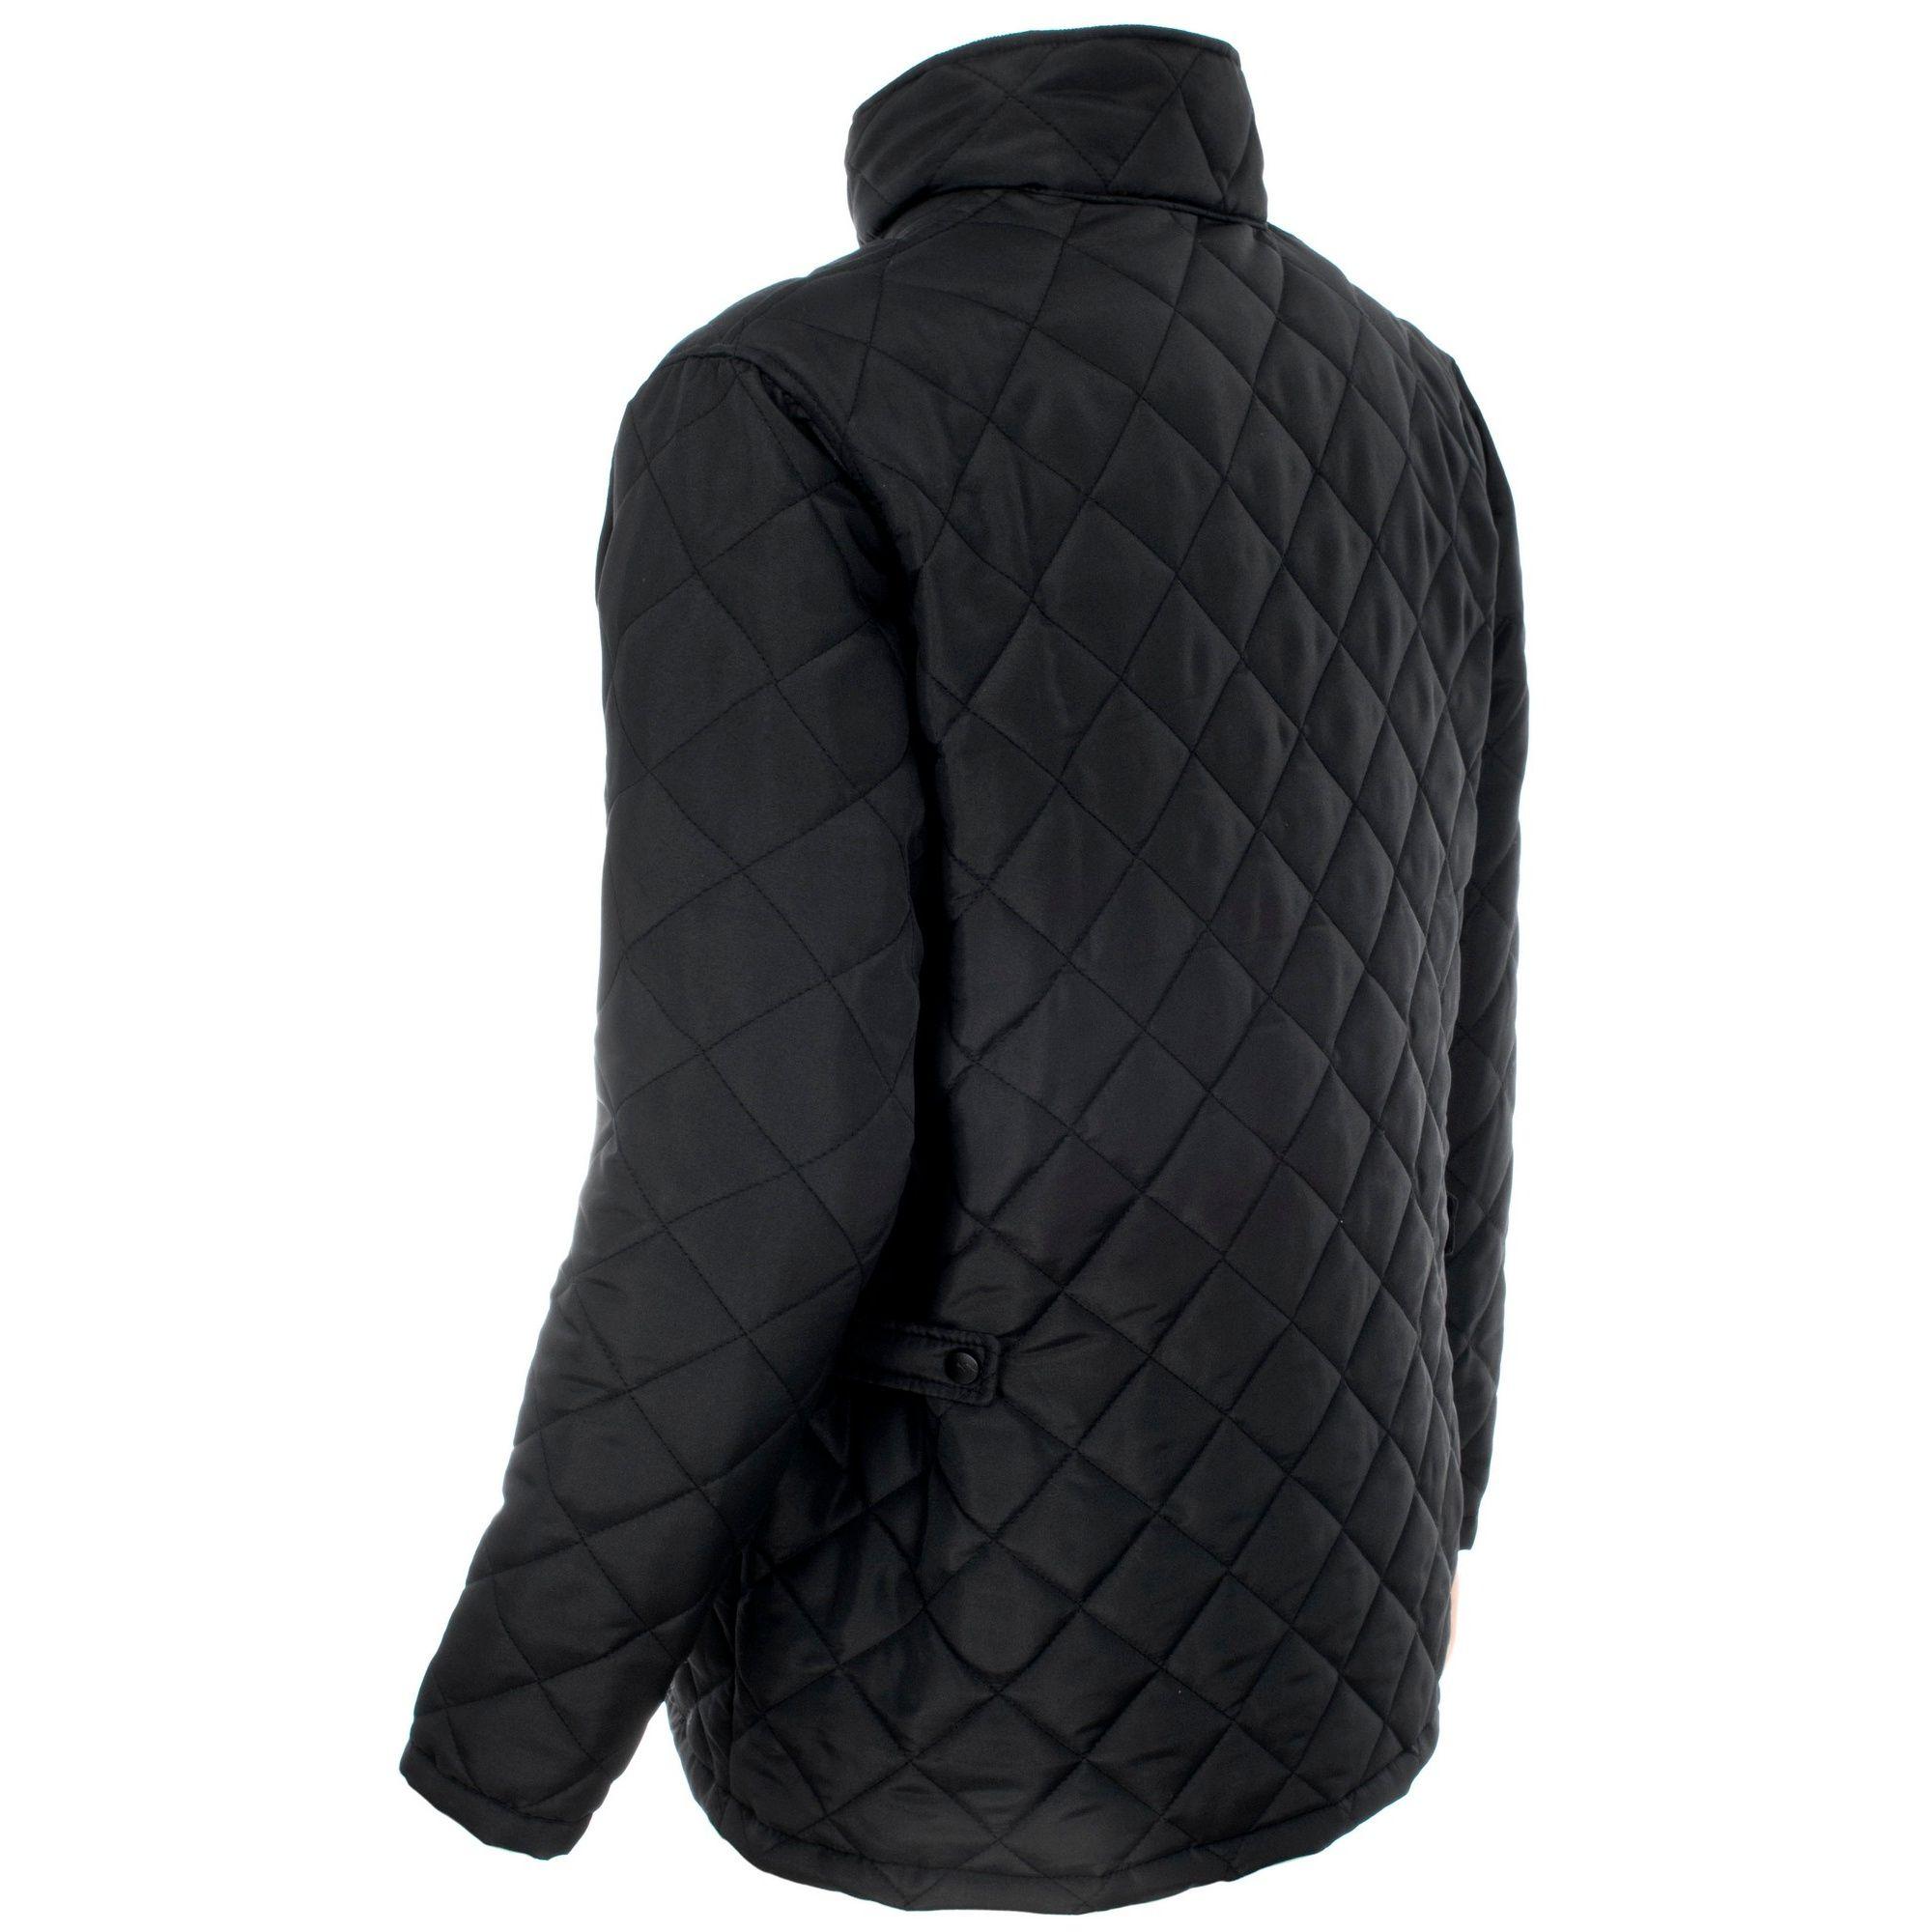 Trespass Mens Argyle Quilted Jacket